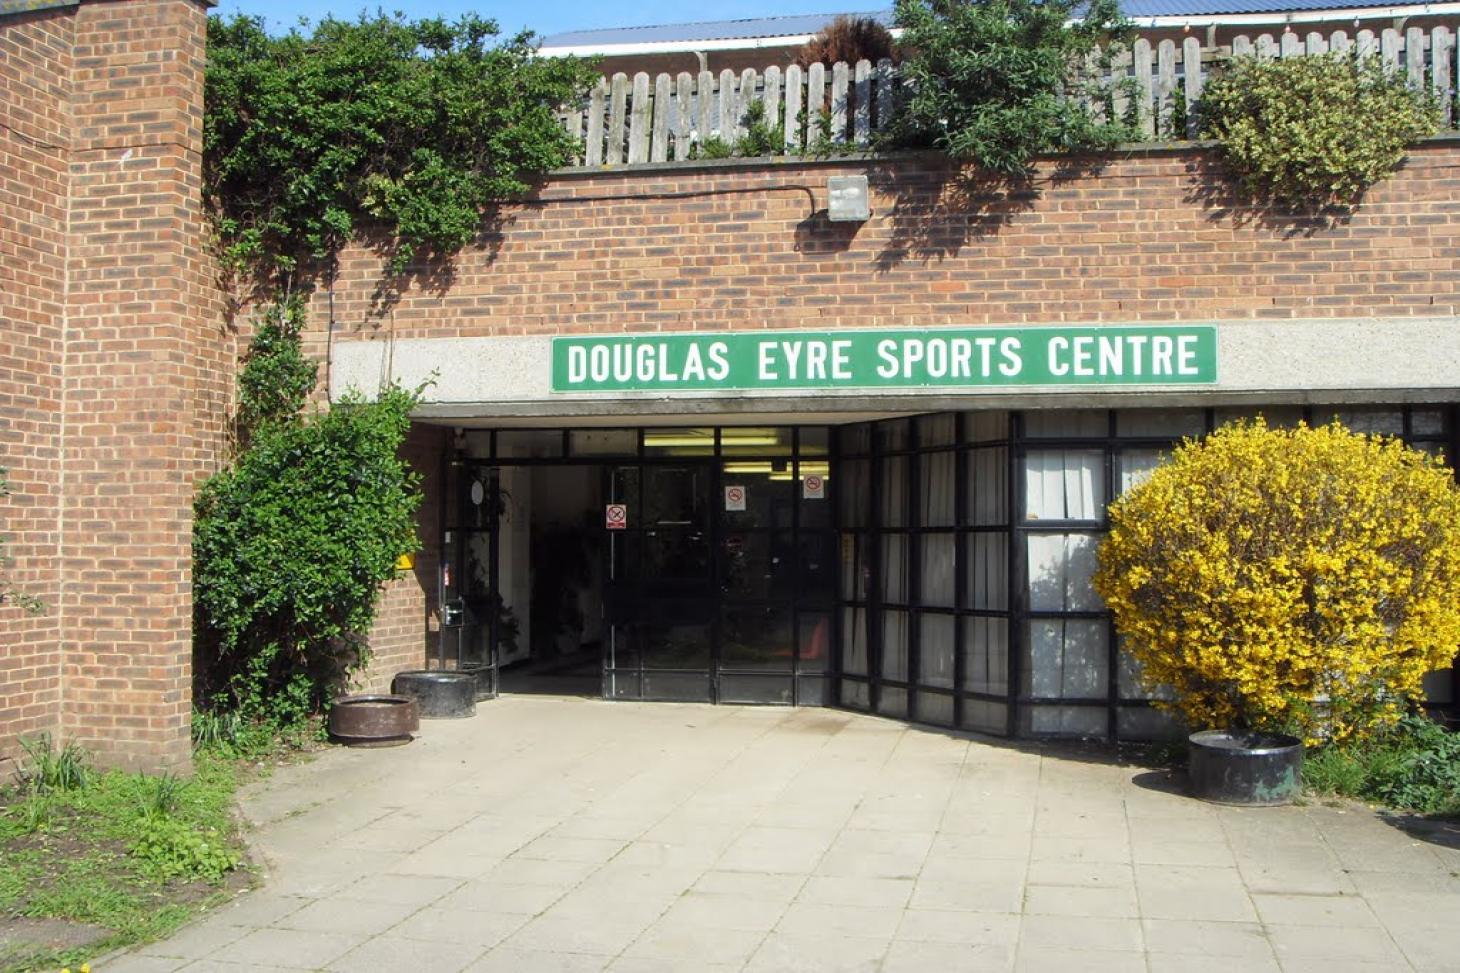 Douglas Eyre Sports Centre Nets | Artificial cricket facilities